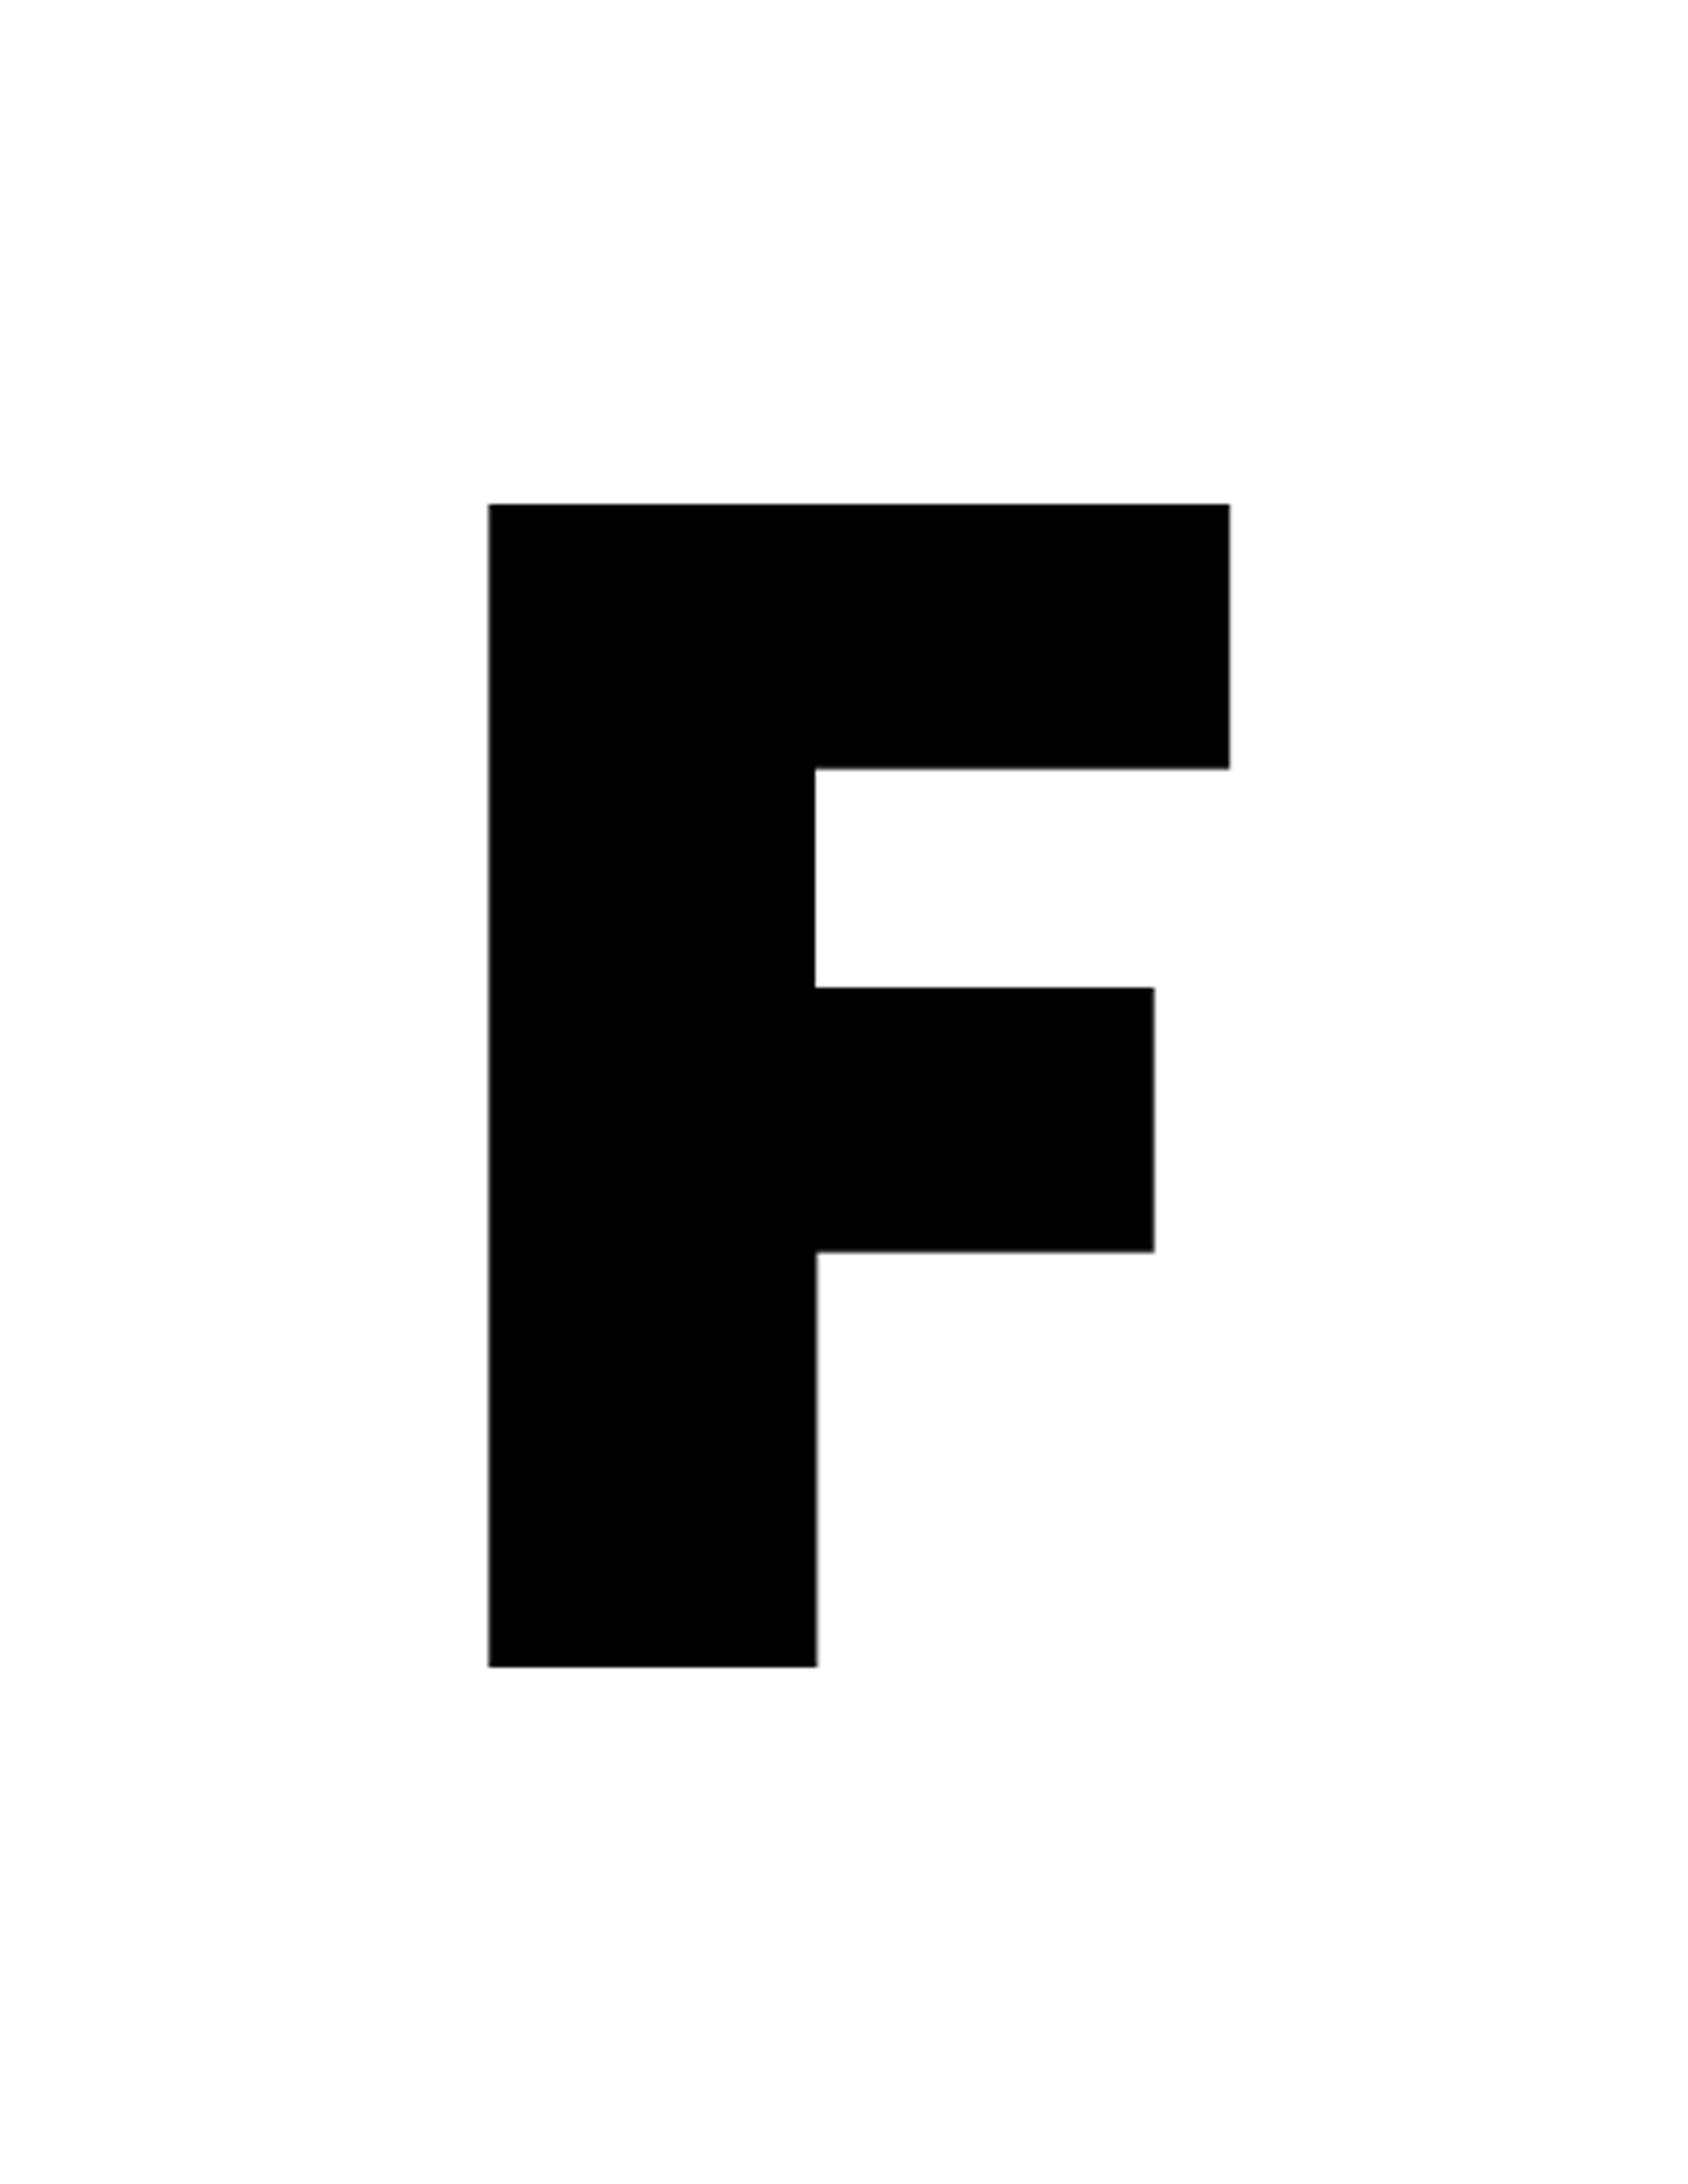 F_1_cover.jpg